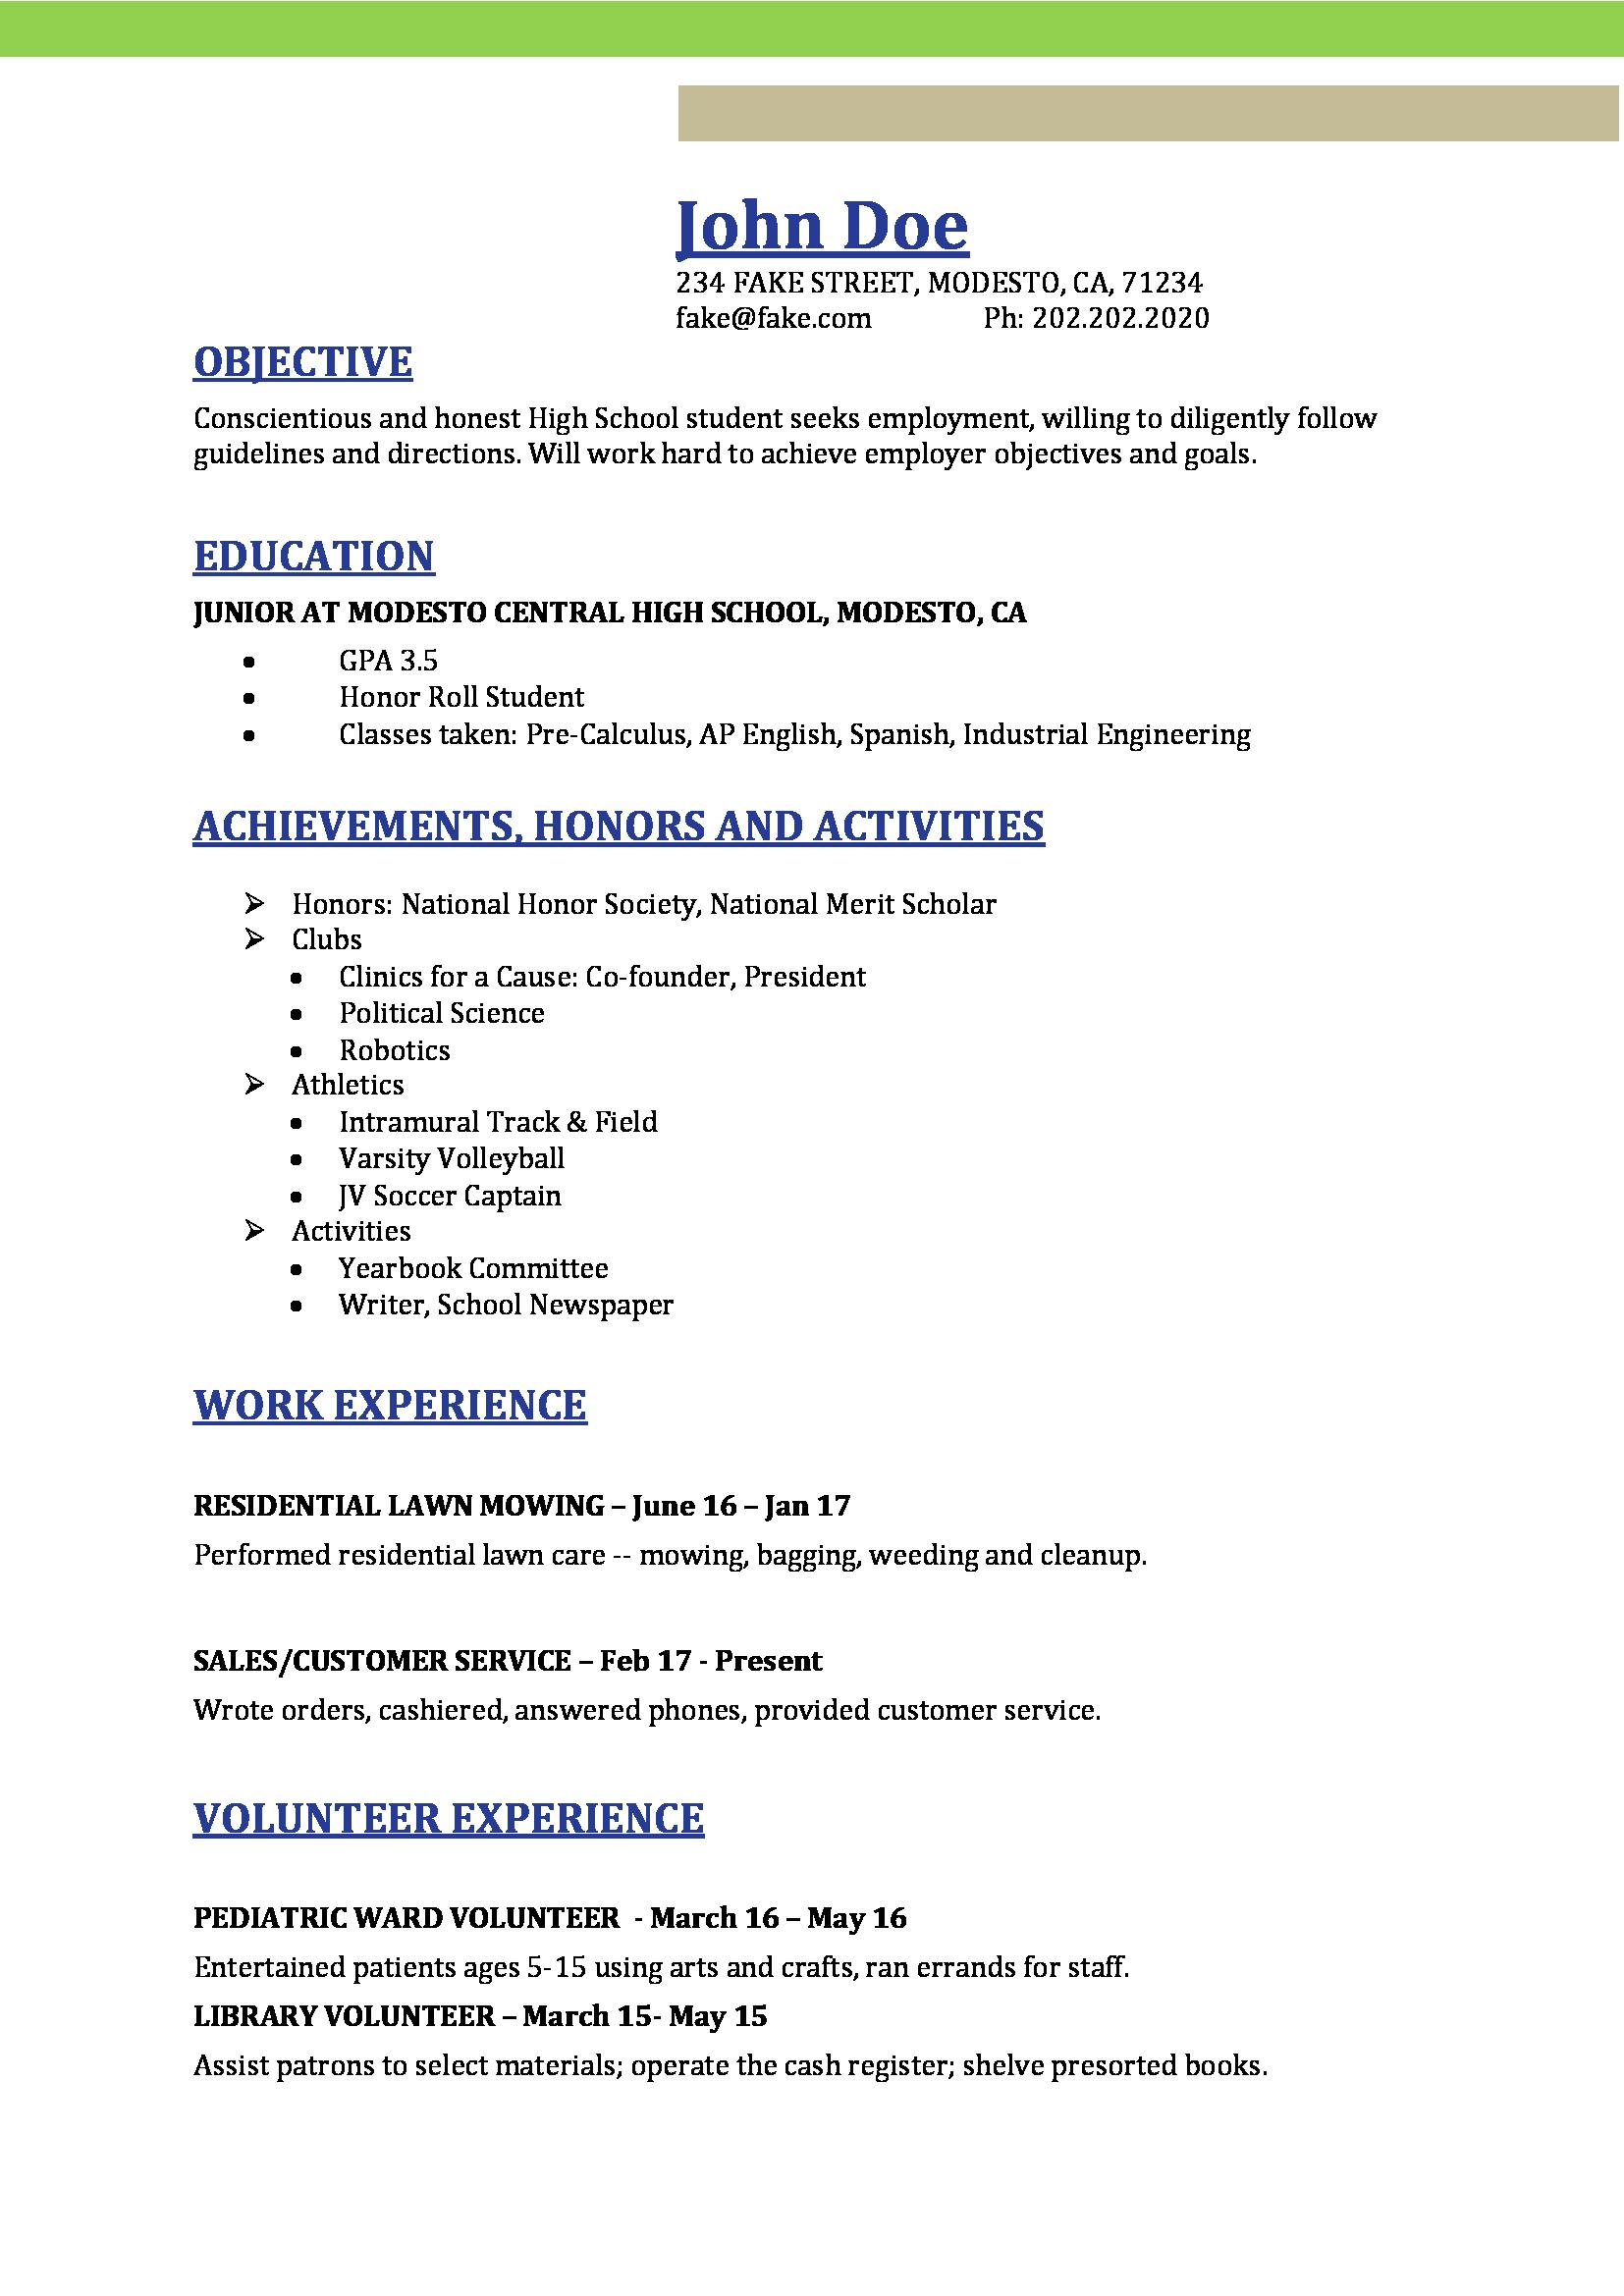 High School Resume High School Resume Templates, Image